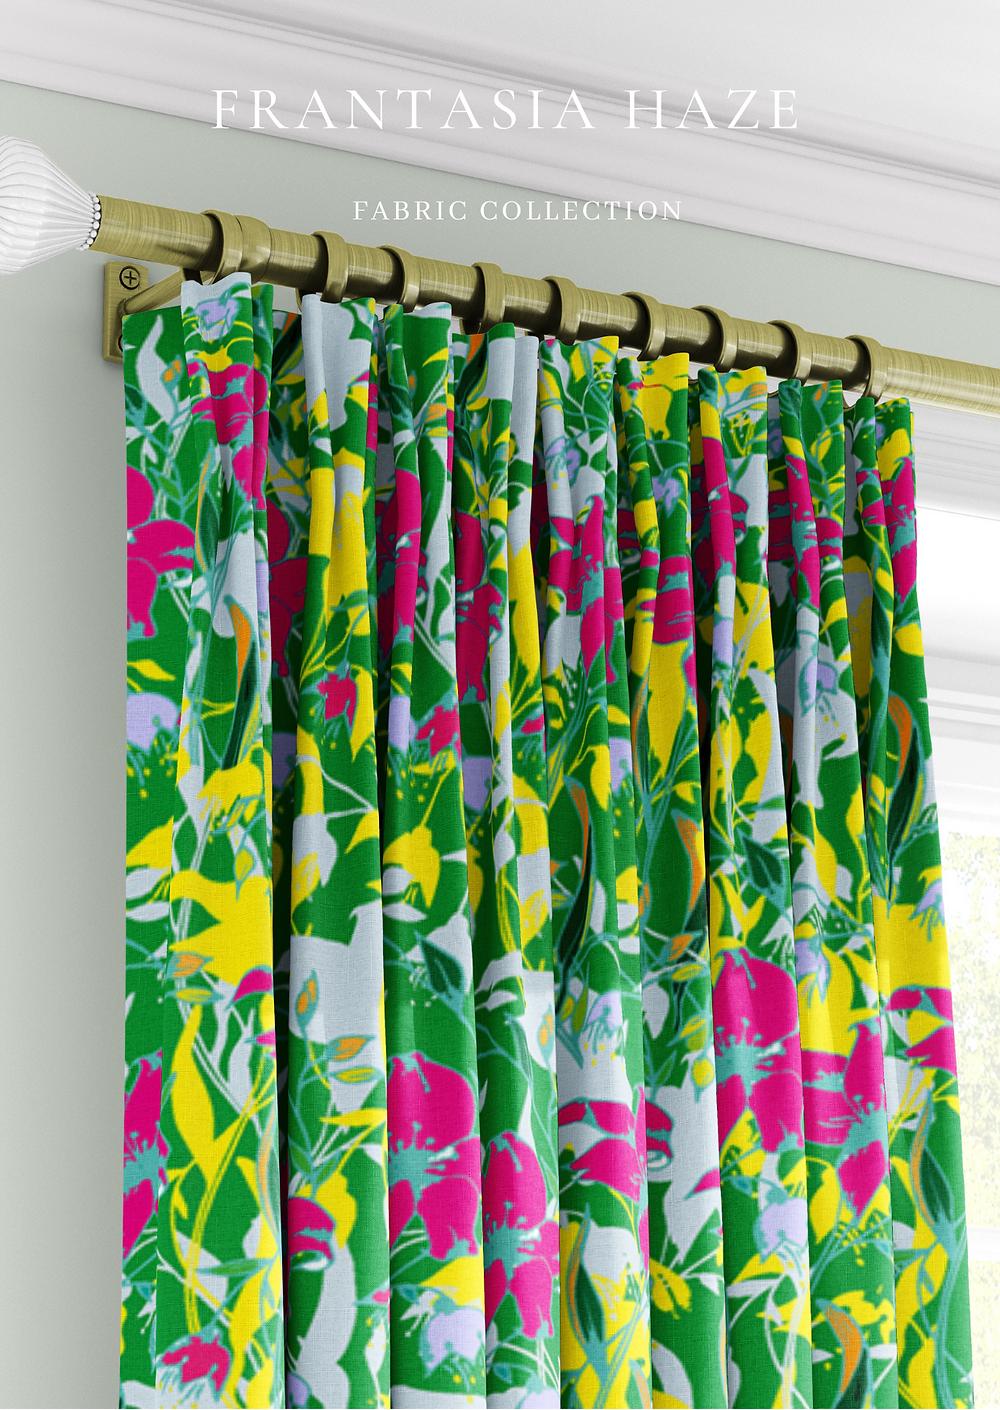 Frantasia Haze Fabric Collection. Curtain Fabric. Floral Fabric. Interior Fabric. Bold Curtain Fabric.